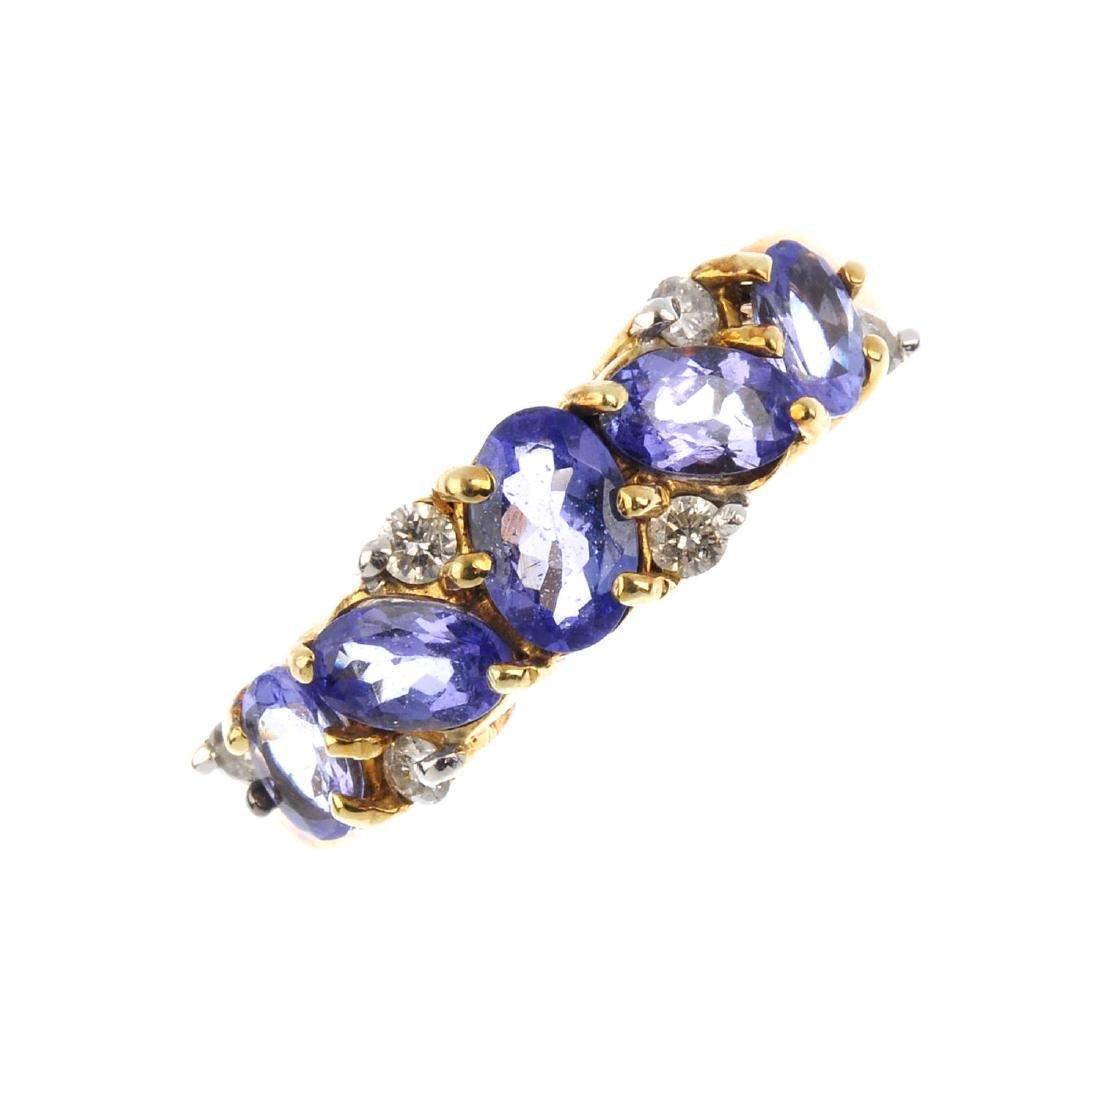 A tanzanite and diamond dress ring. The graduated